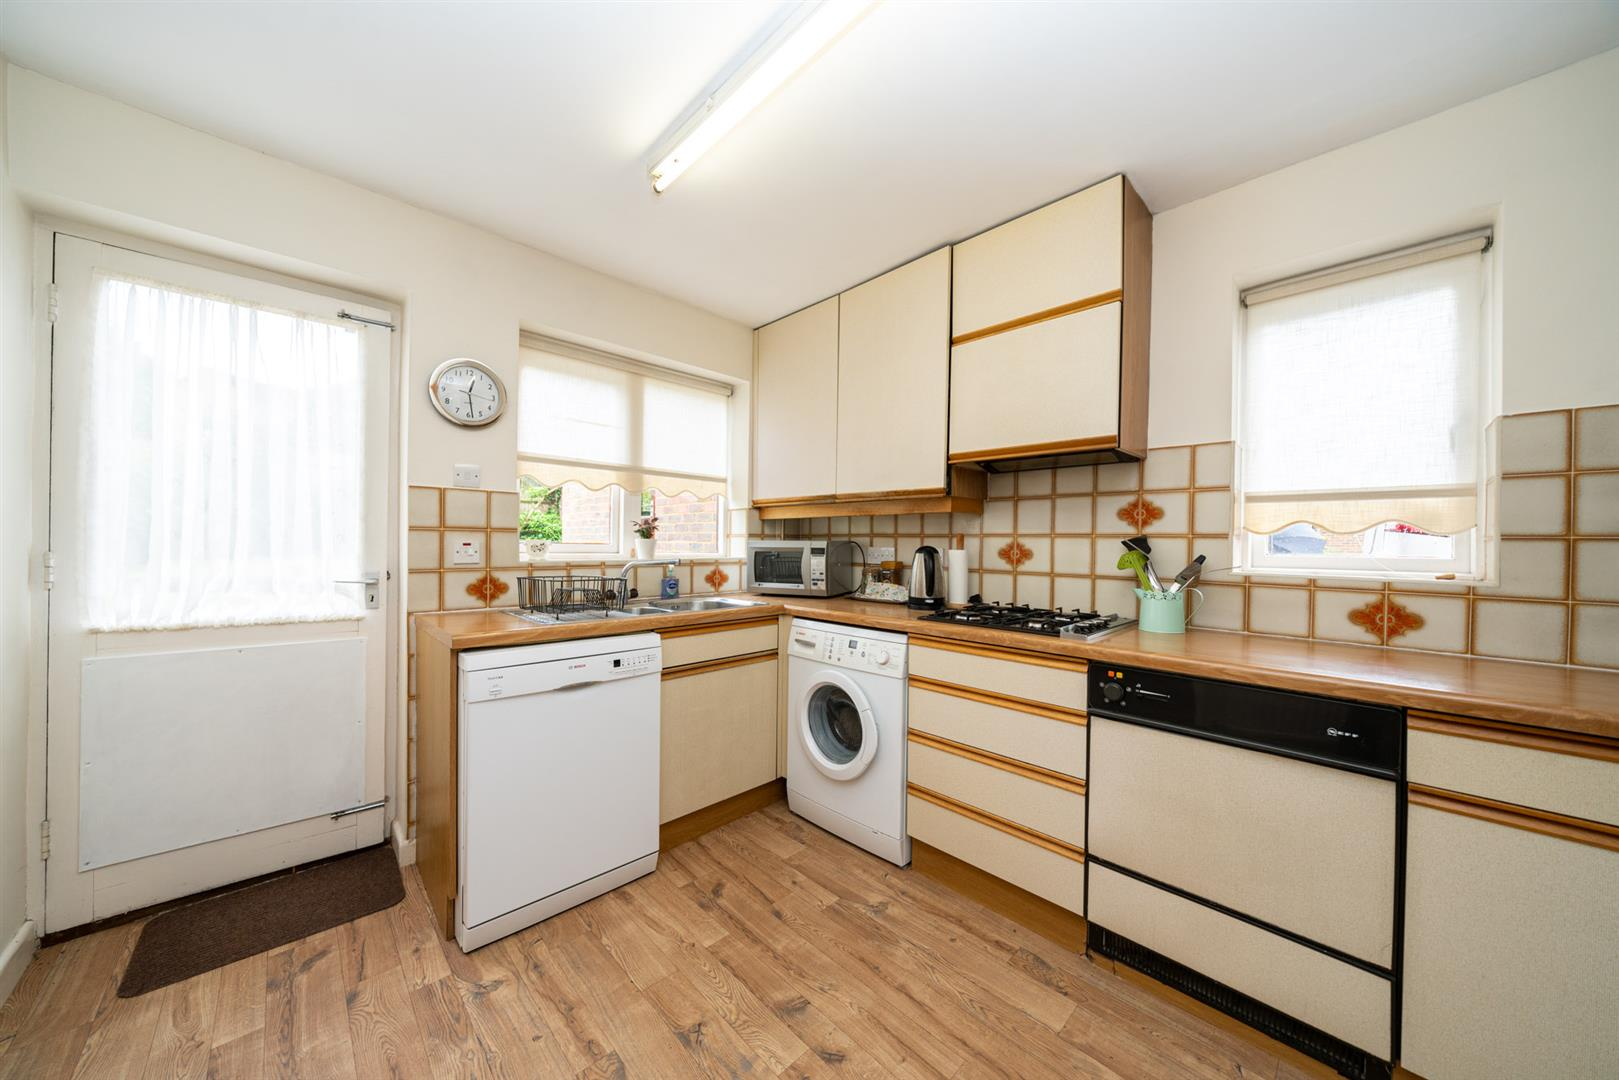 6-Rosehill-4122 - kitchen 1.jpg